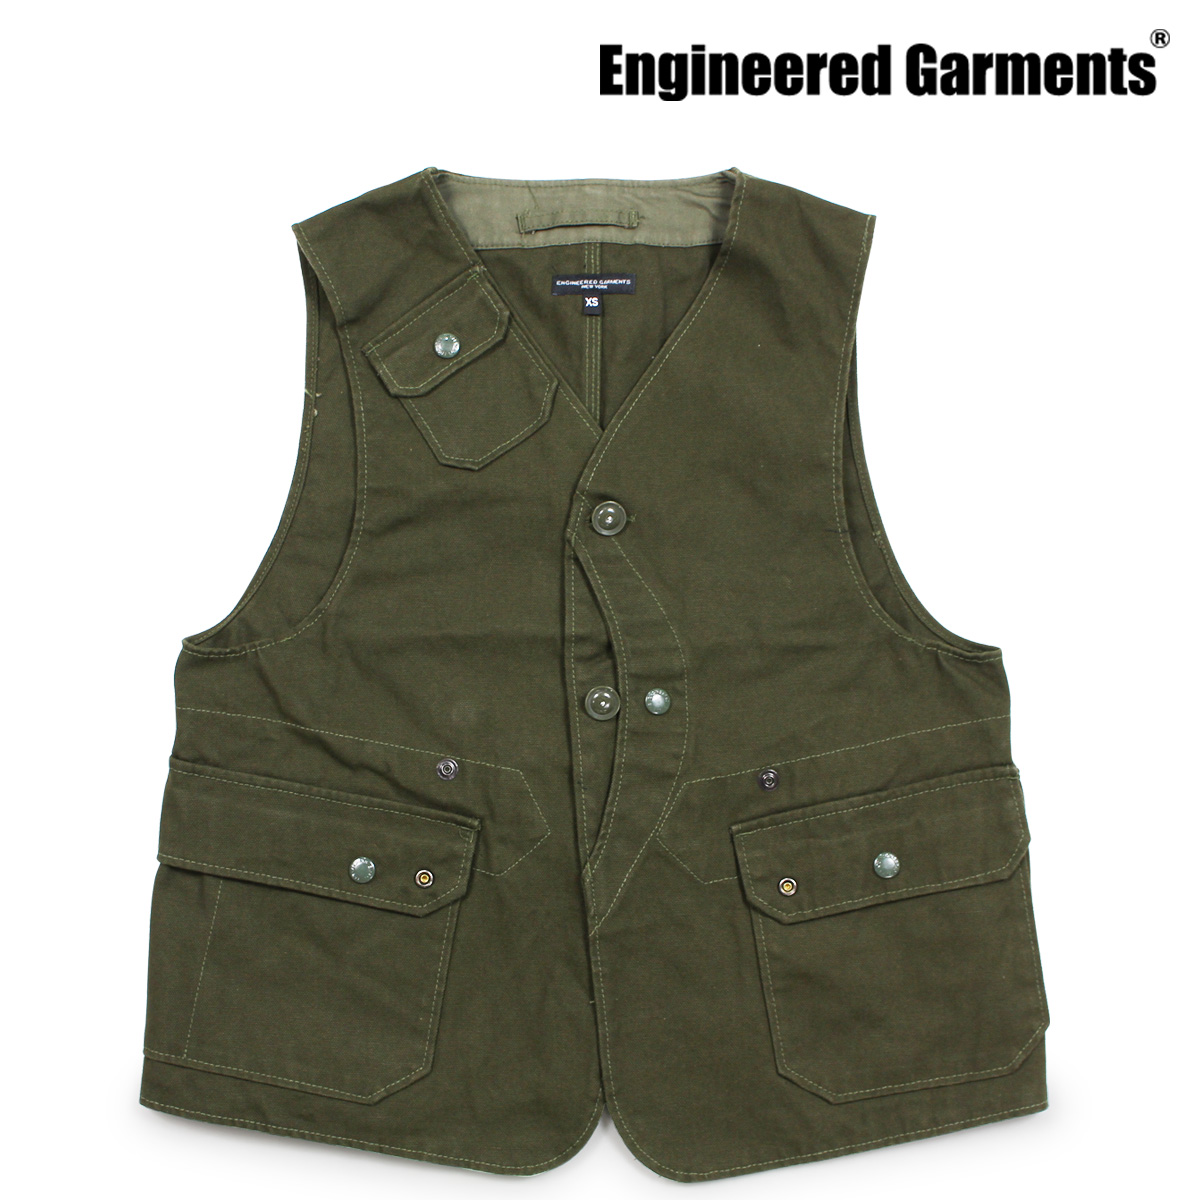 ENGINEERED GARMENTS UPLAND VEST エンジニアドガーメンツ ベスト メンズ ジレ オリーブ